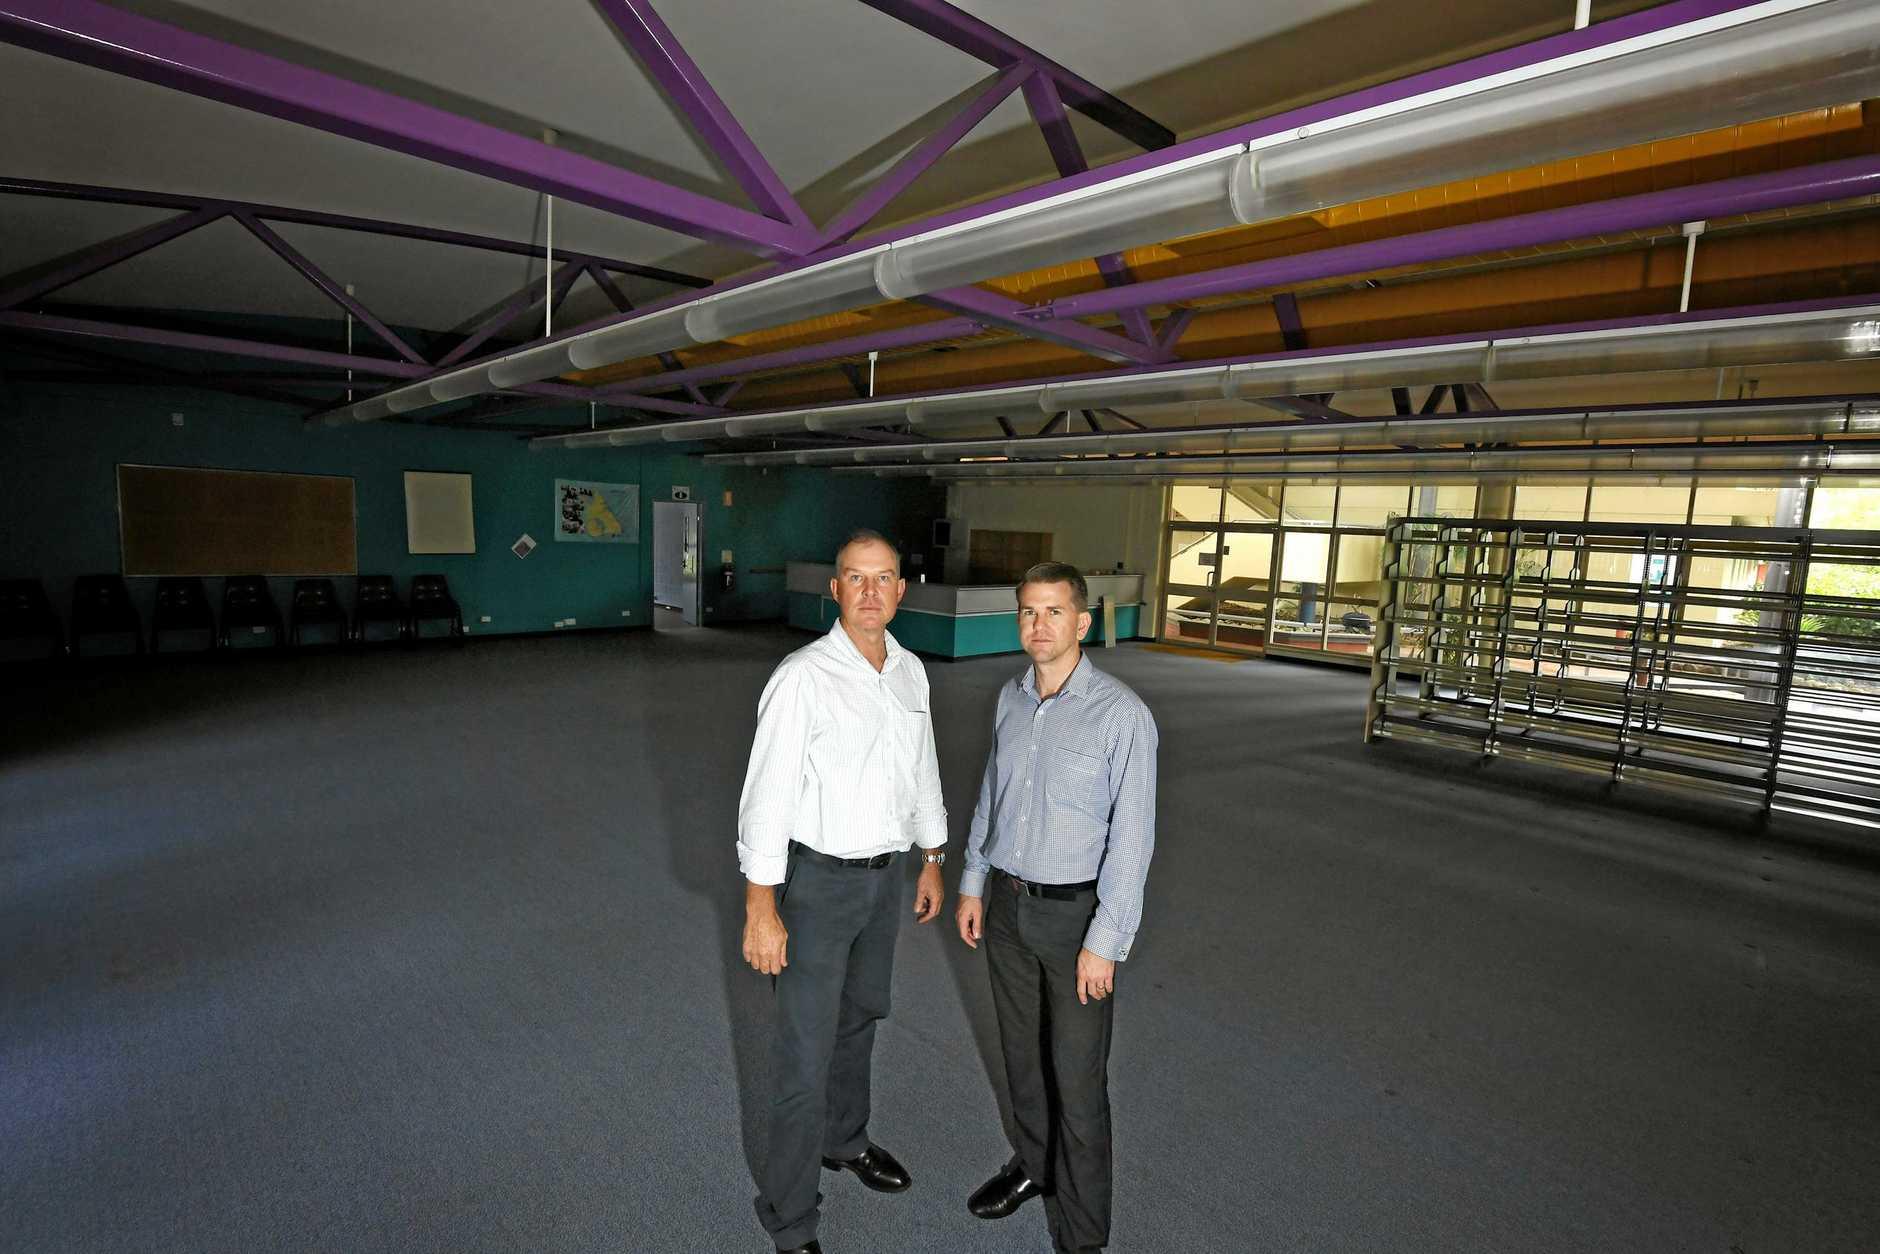 Tony Perrett and Jarrod Bleijie inside the empty TAFE building.